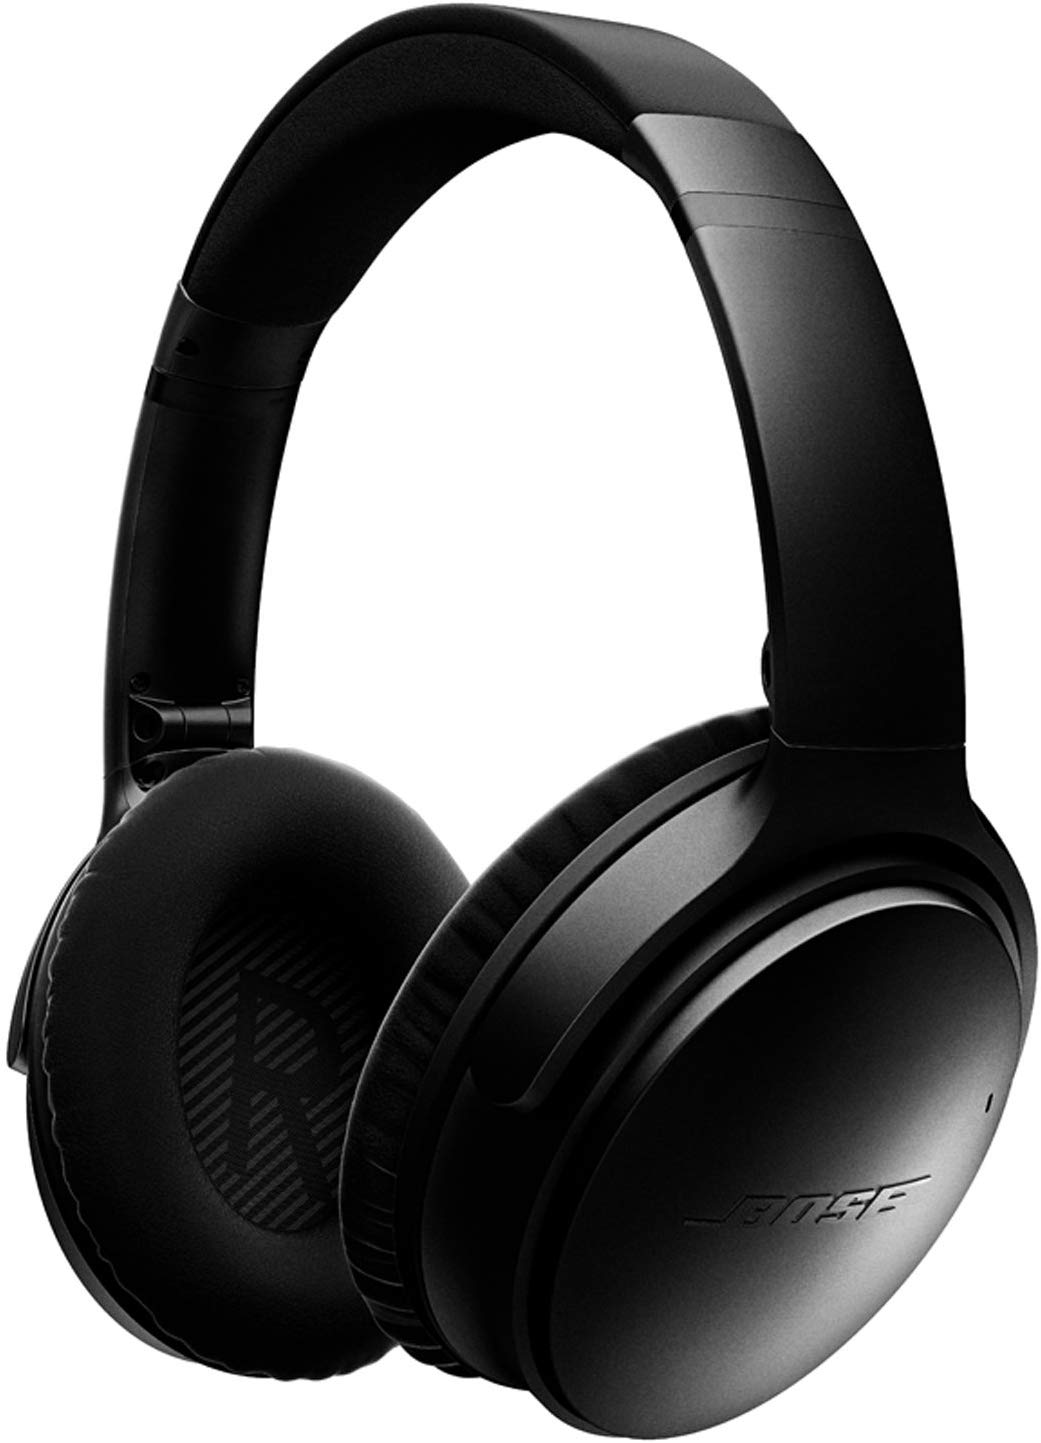 New Blinq Customers: Bose QuietComfort 35 Series I Wireless Headphones (Black)